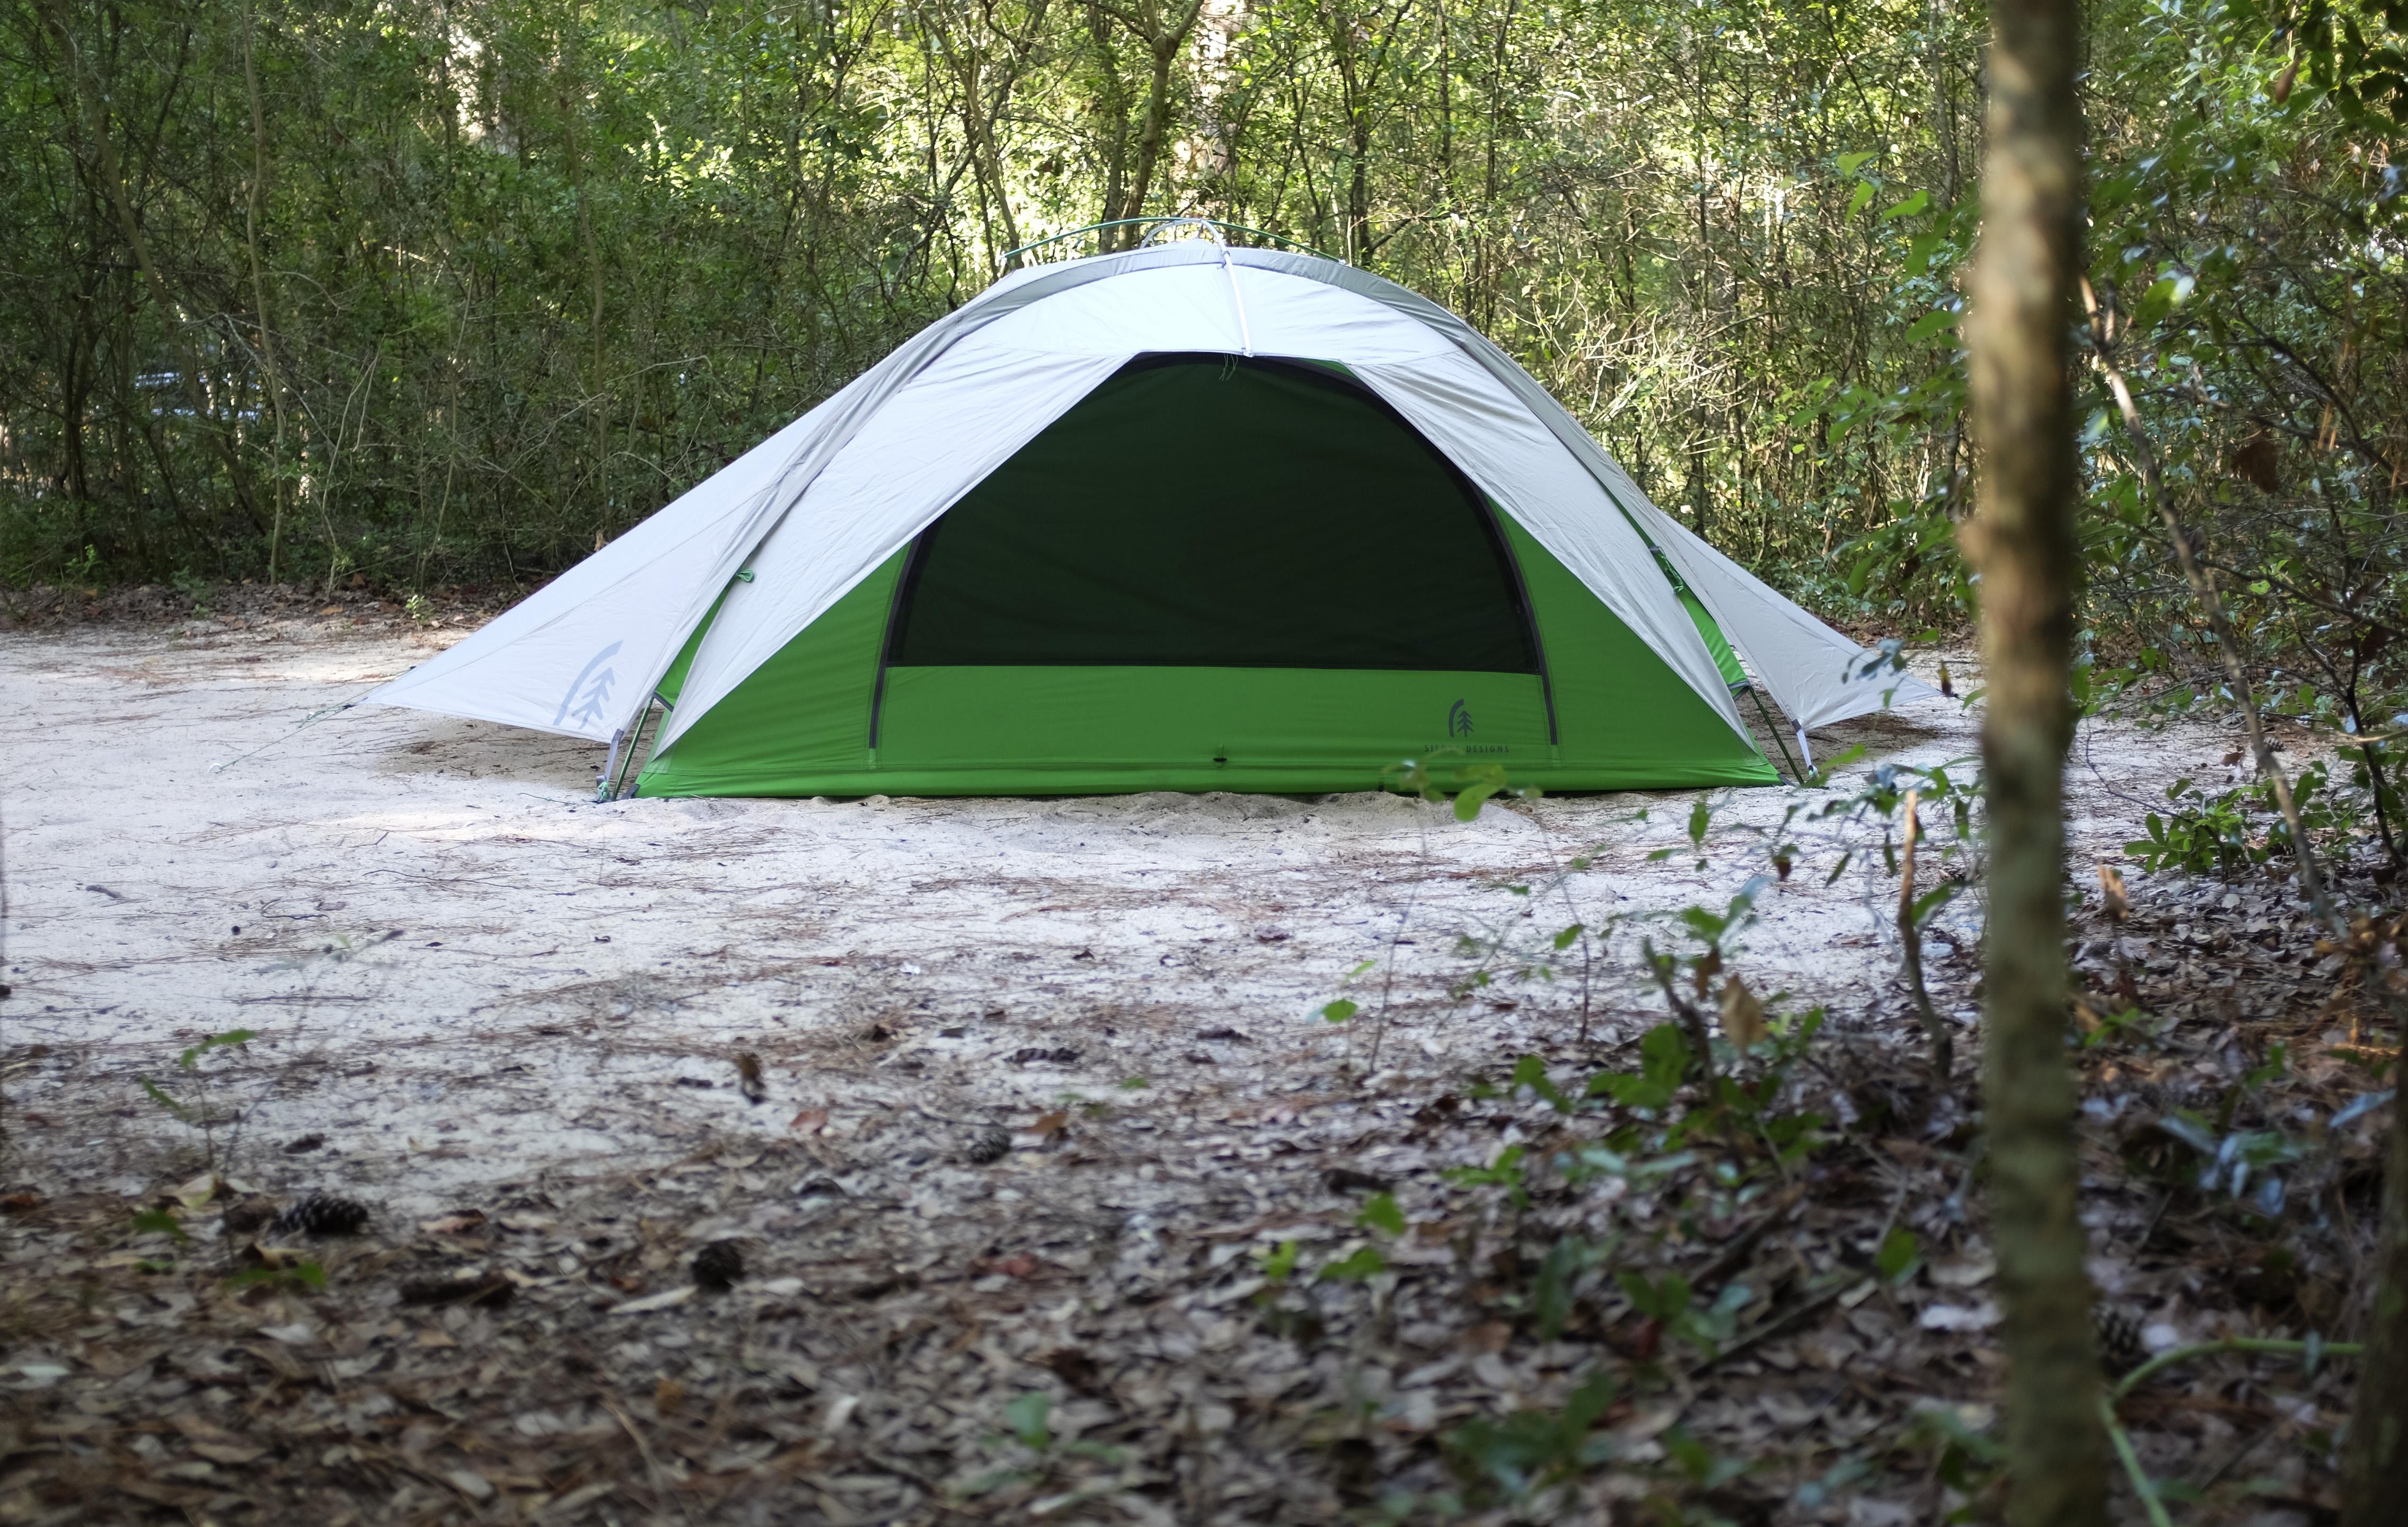 Sierra Designs Flash 3 tent tent c&ing sierra nevada flash & Gear Review u2013 The Flash 3 Tent by Sierra Designs u2013 The Wilder Minds